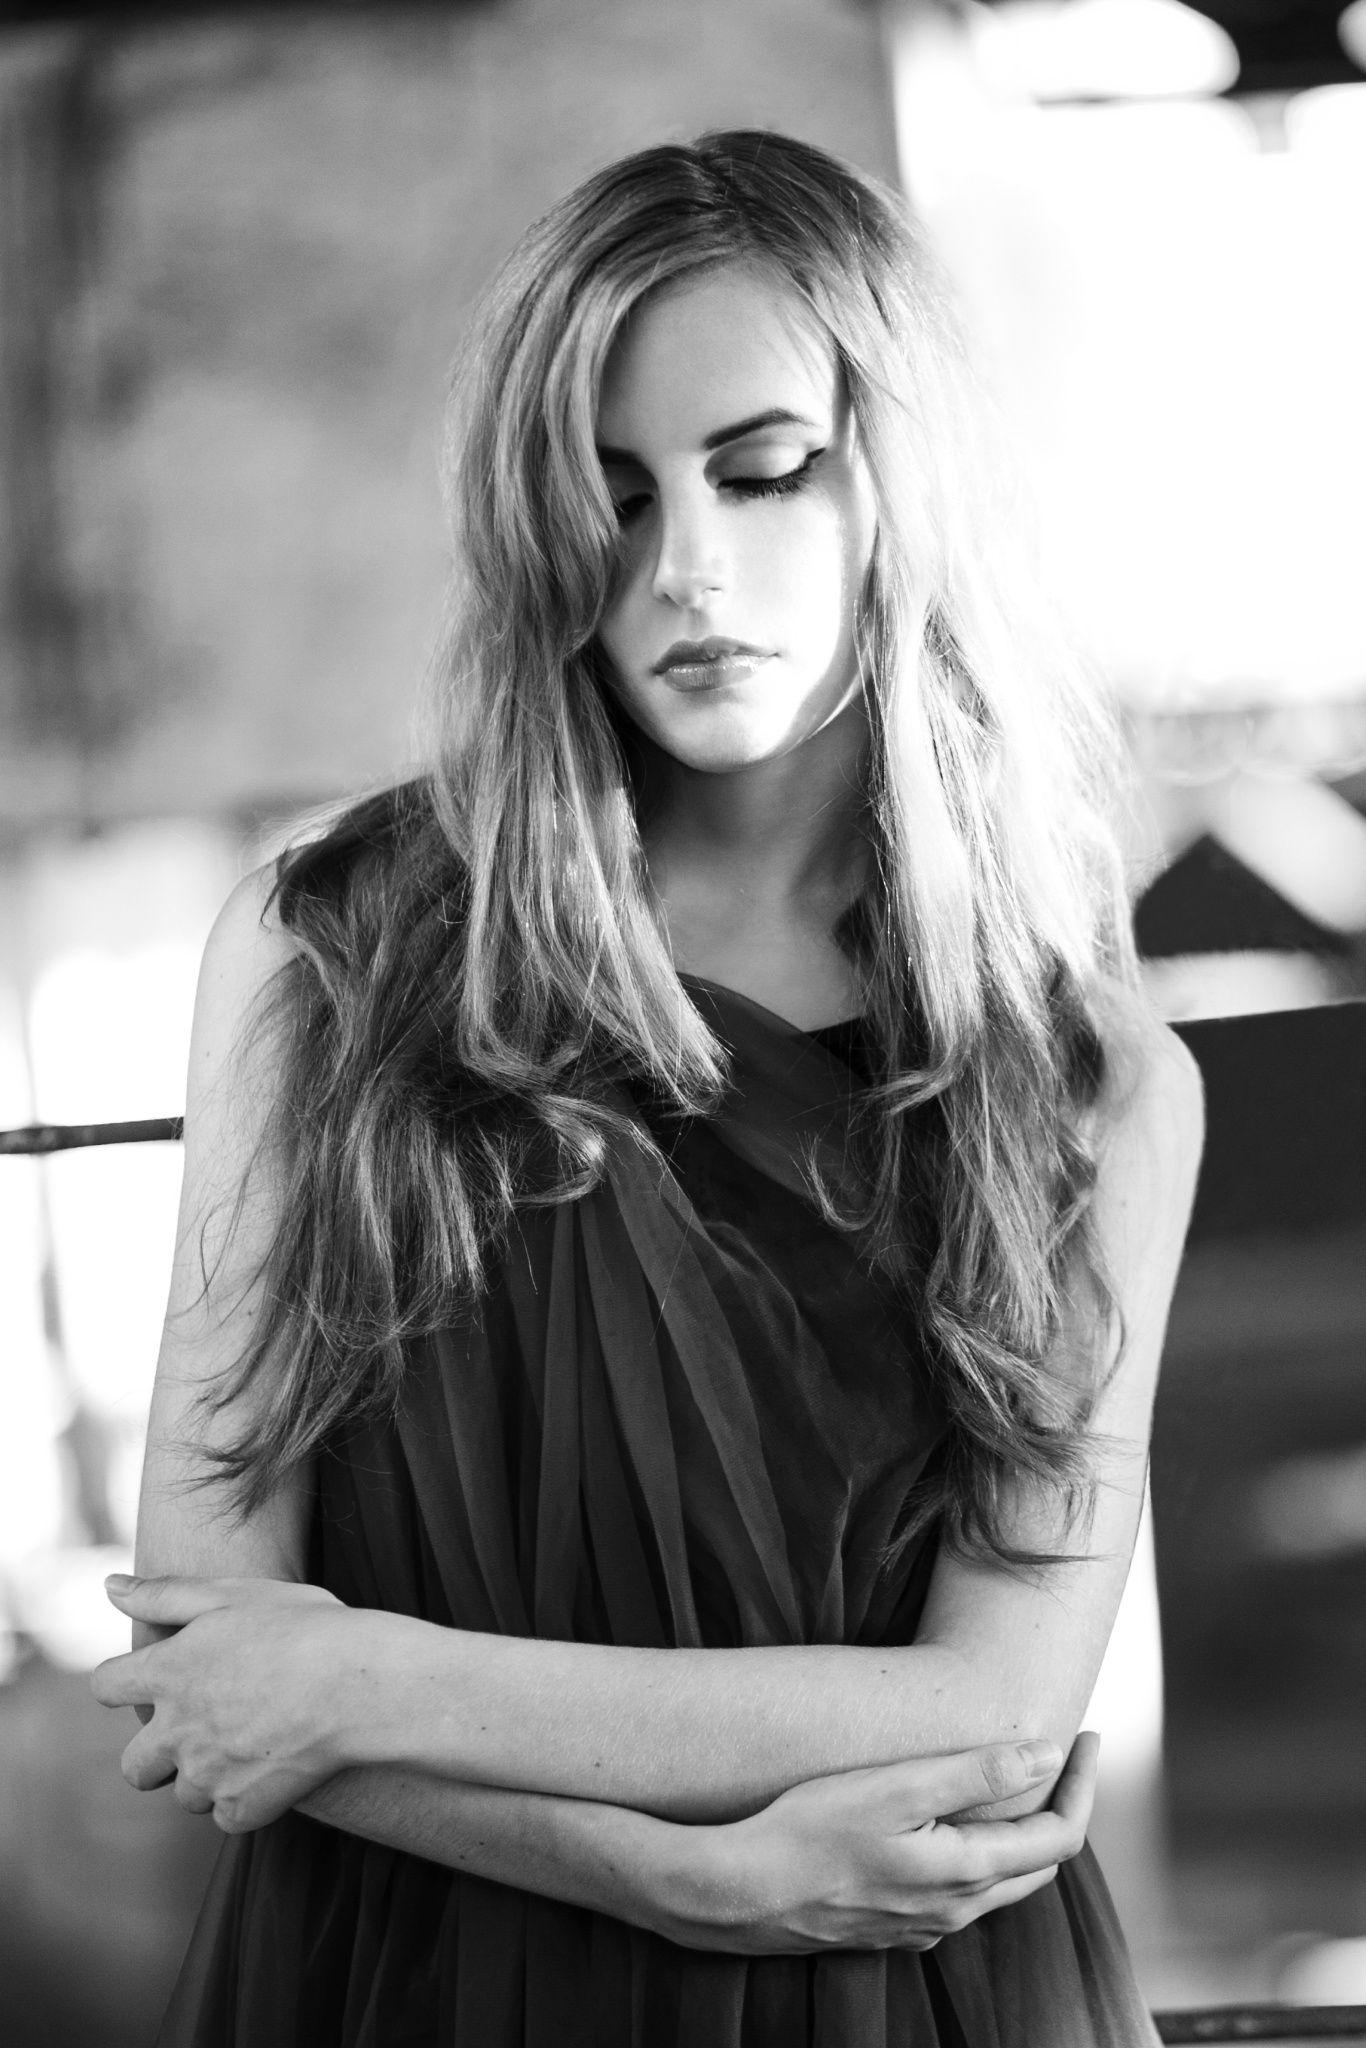 Aleksandra by Alex Sebastian on 500px